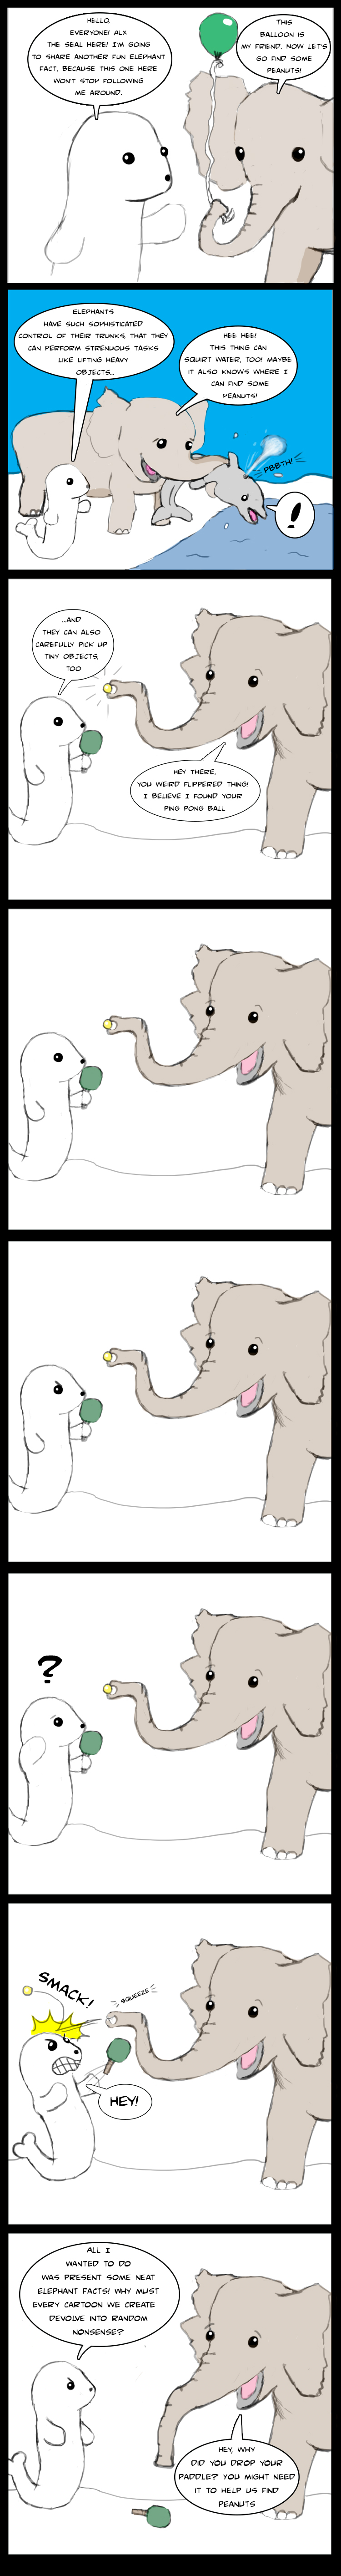 elephant-fact-2.jpg